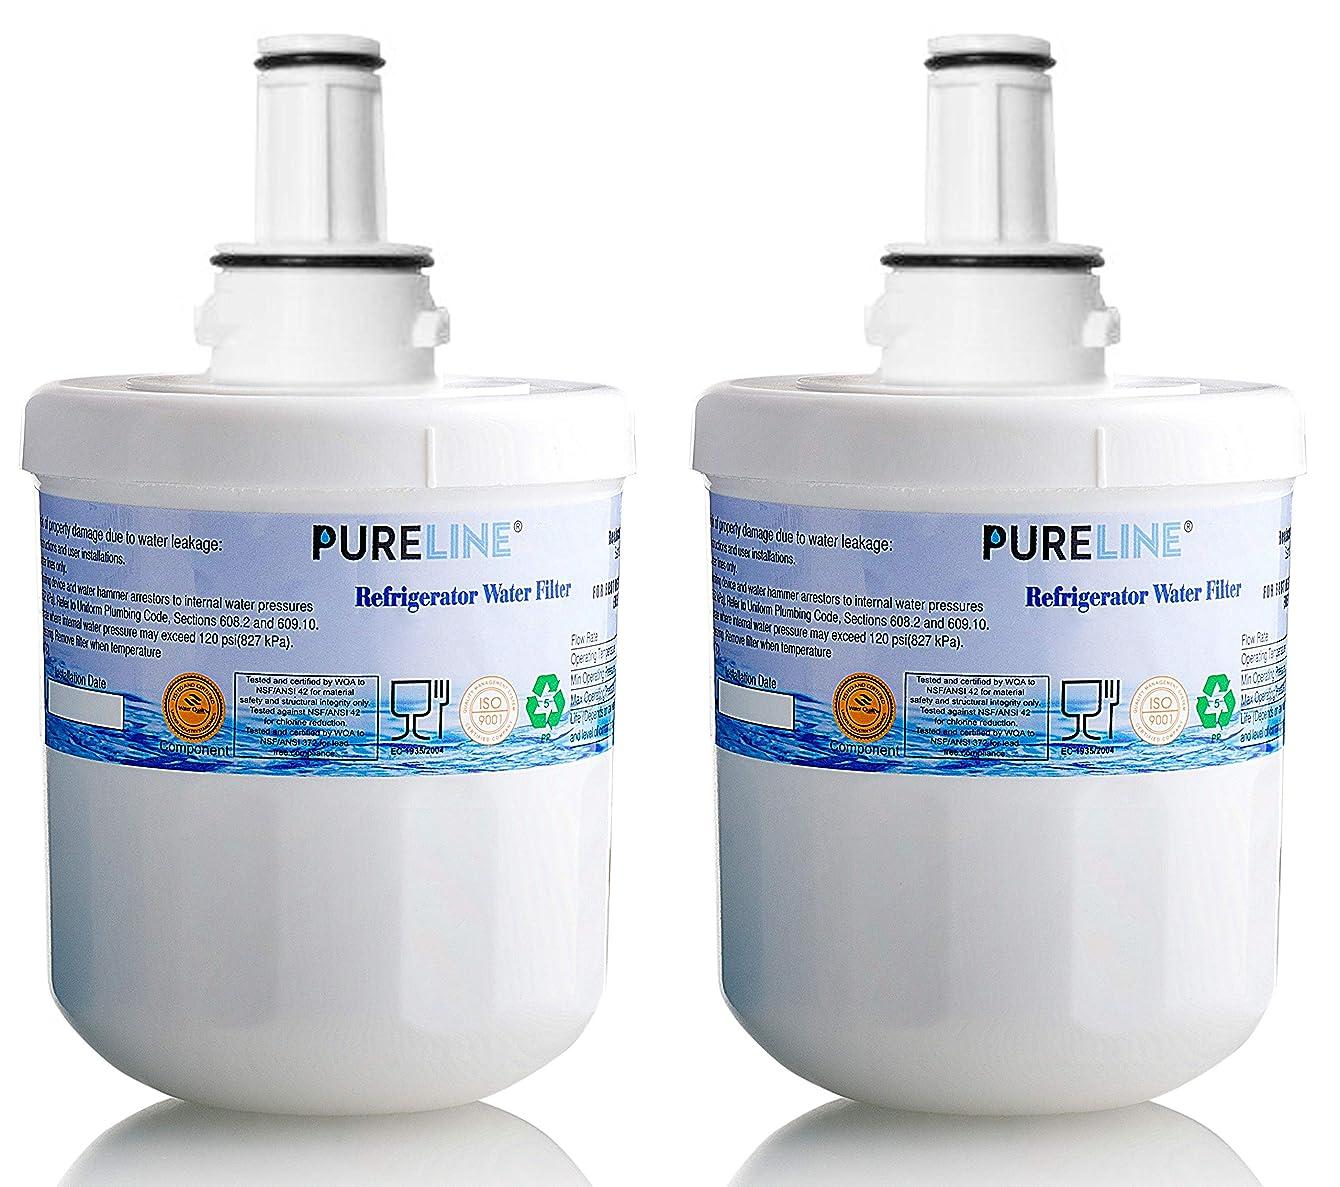 Compatible Samsung Water Filter DA29-00003G Samsung Aqua Pur Plus Replacement with Advanced Filtration. Also Fits Aqua-Pure Plus DA29-00003A, DA29-0003B and PUR W10132126 - By Pure Line (2 Pack)